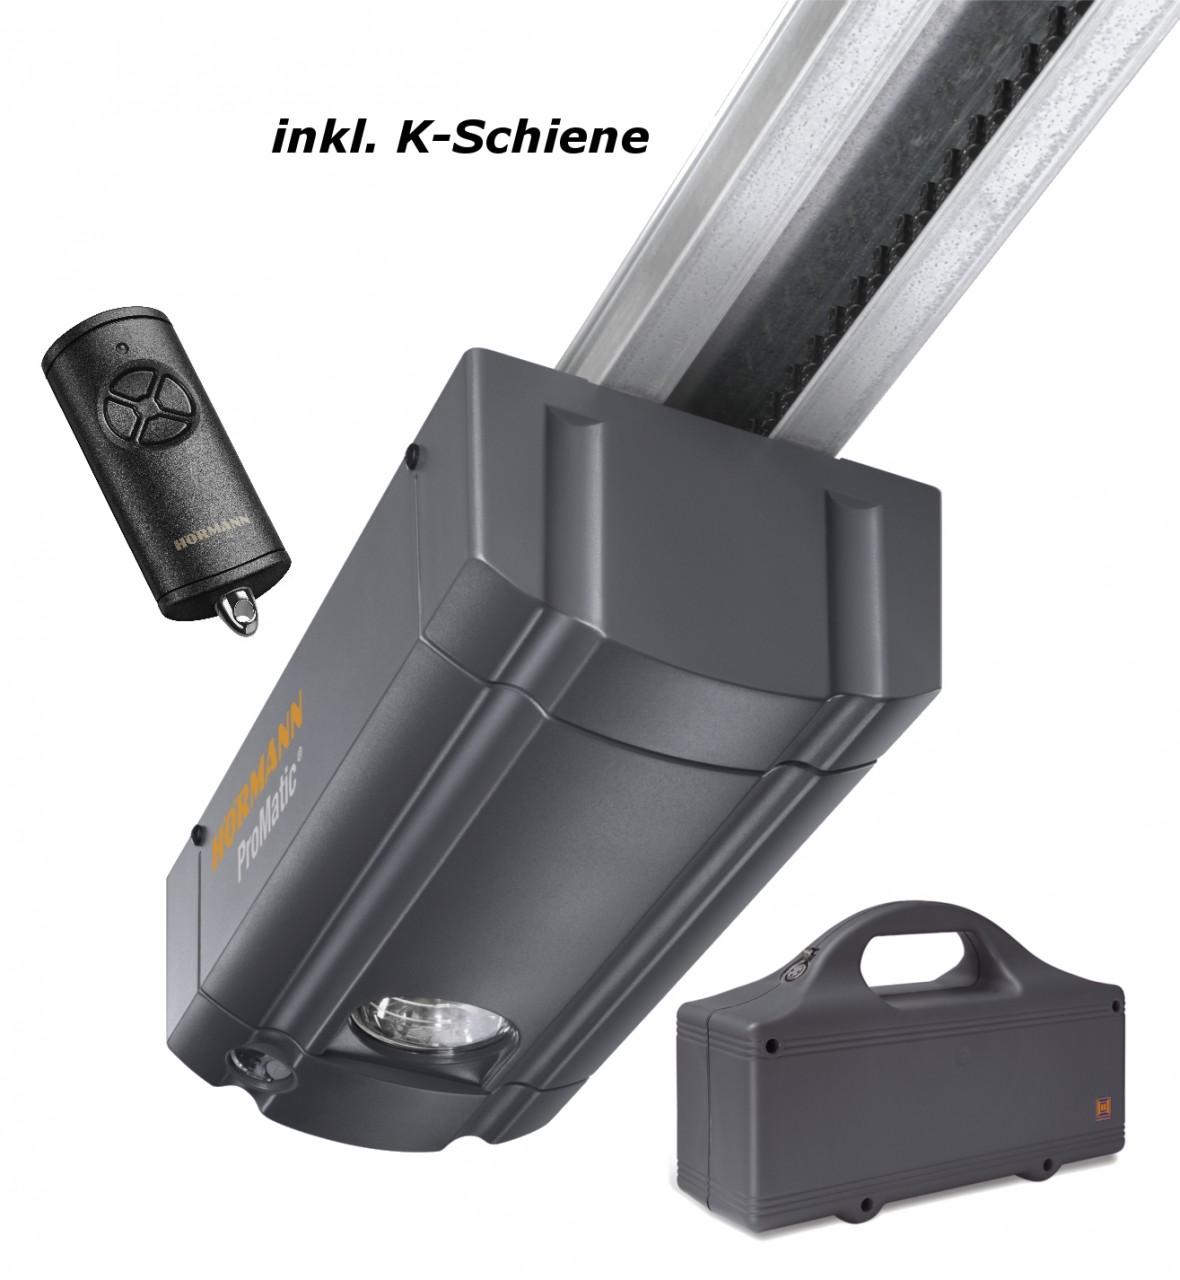 Hörmann ProMatic Akku mit K-Schiene